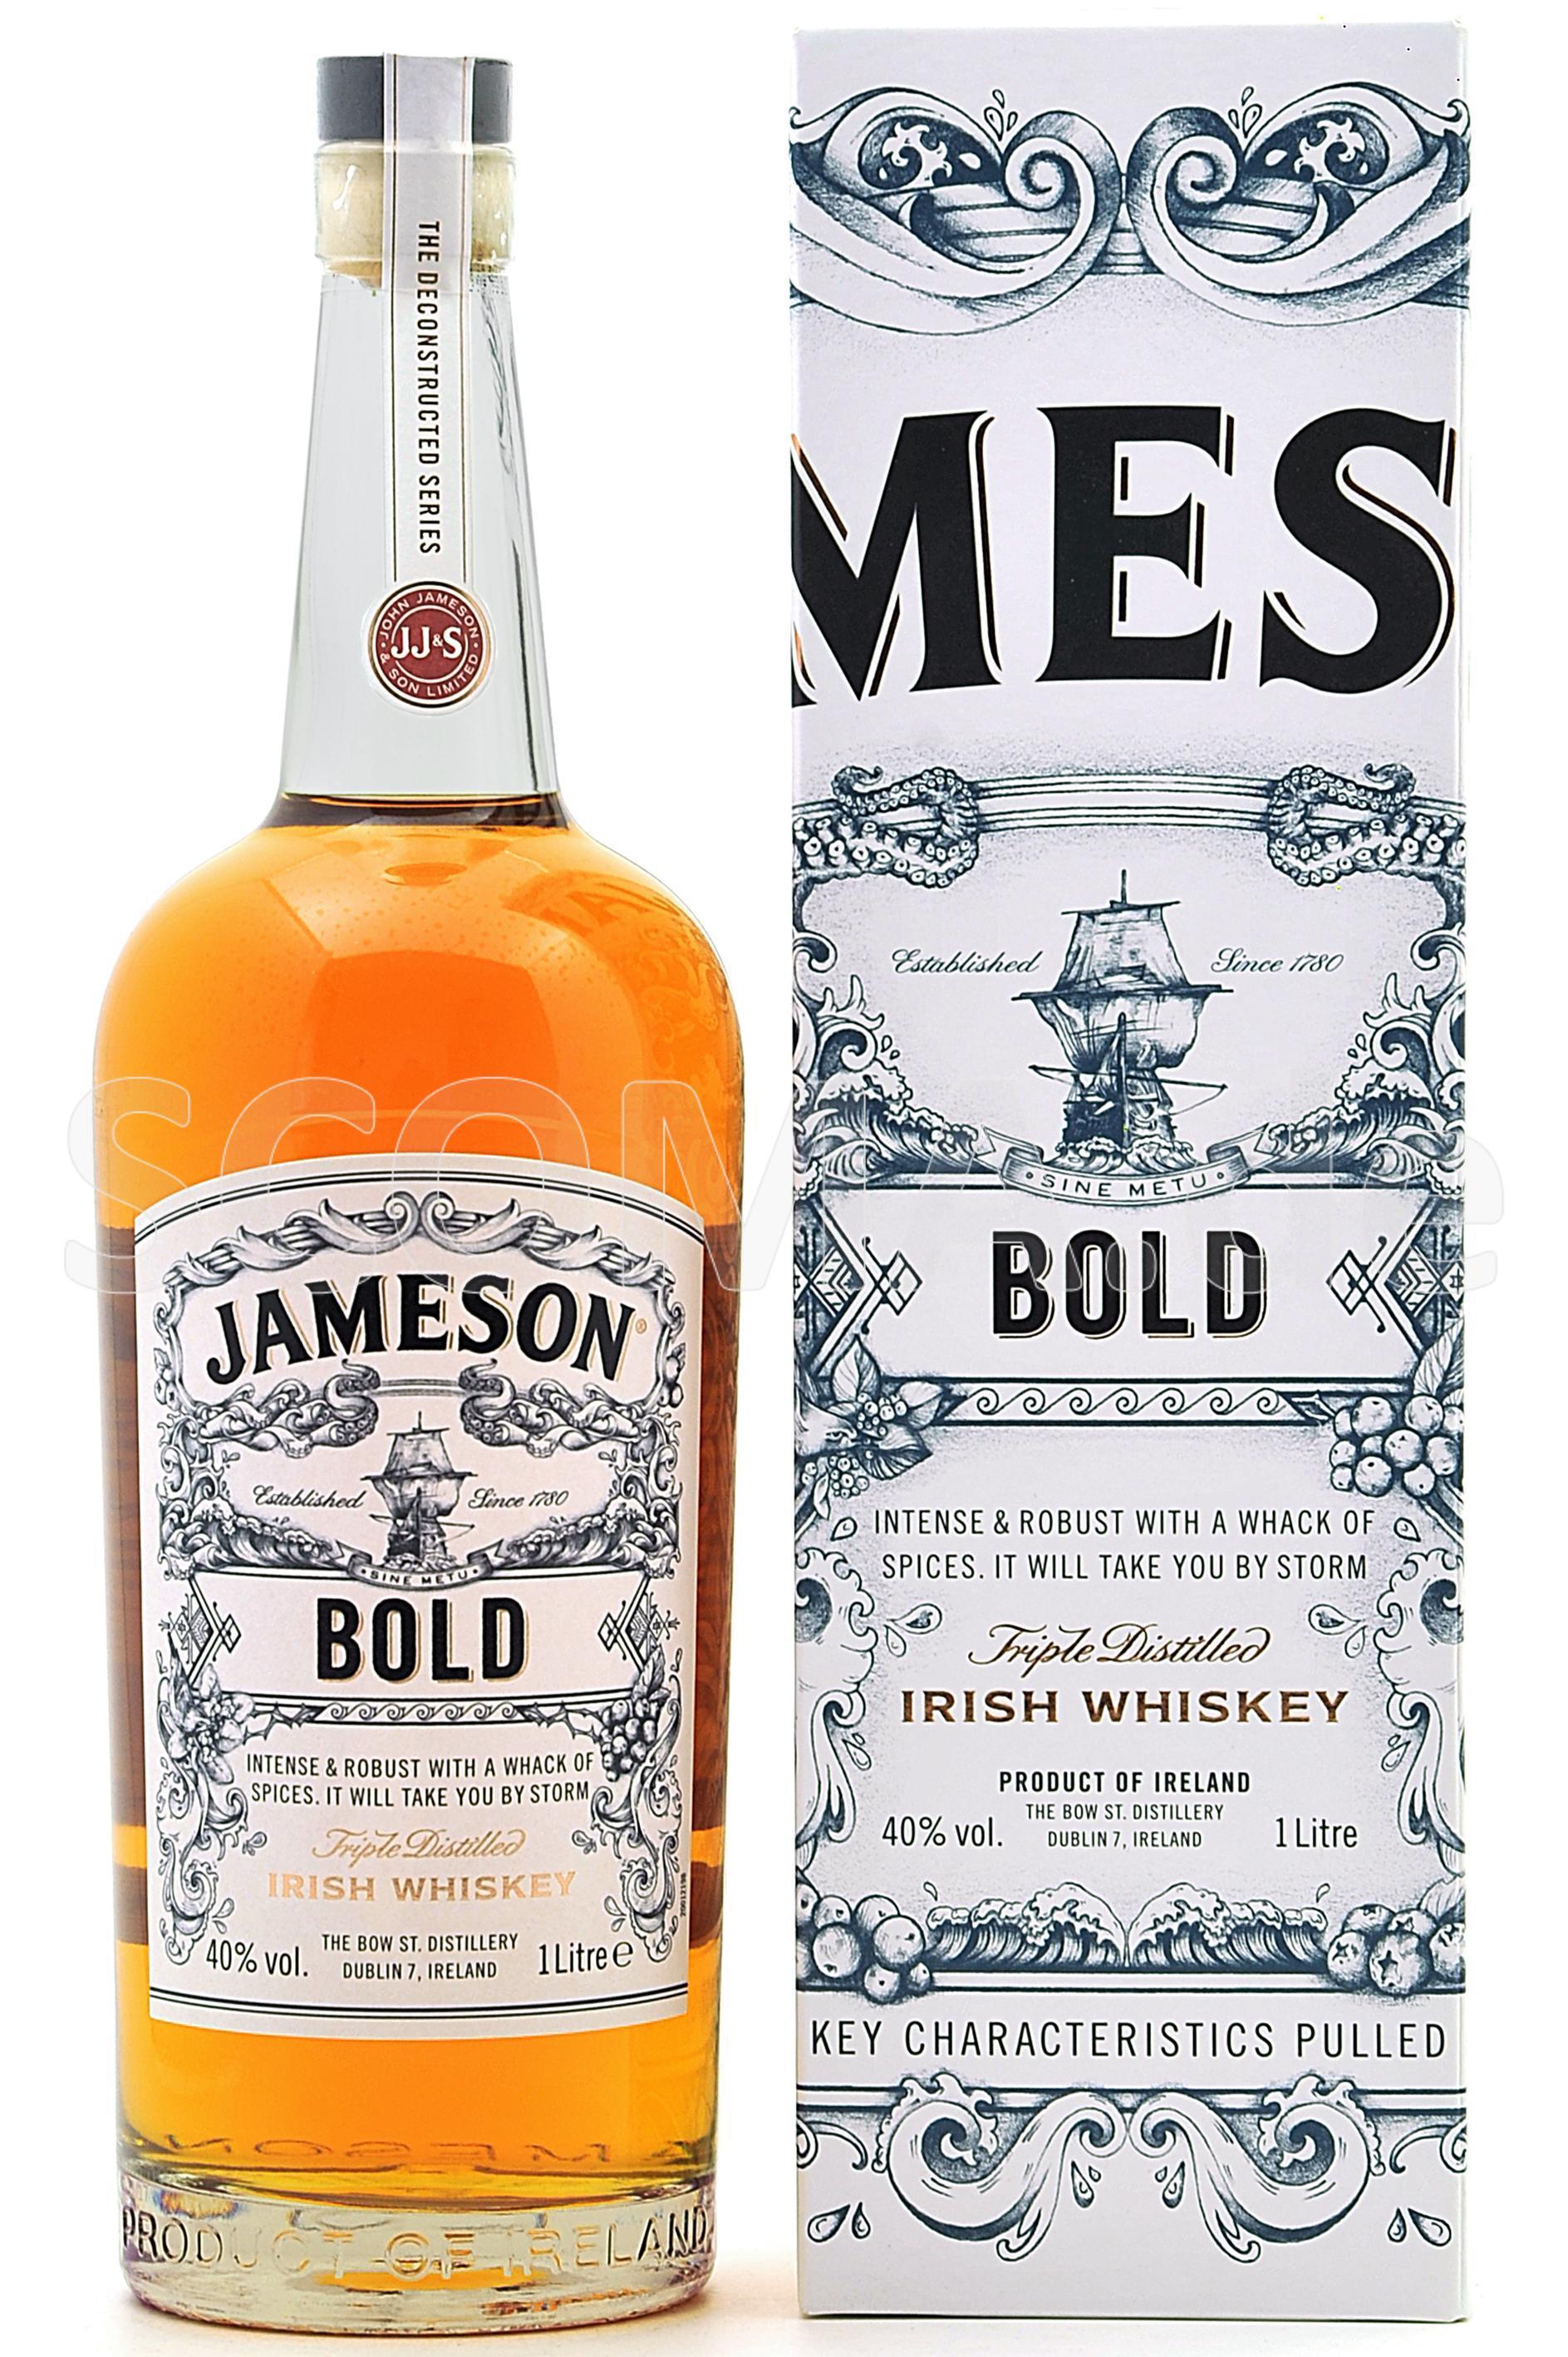 Jameson Bold - The Deconstruct...